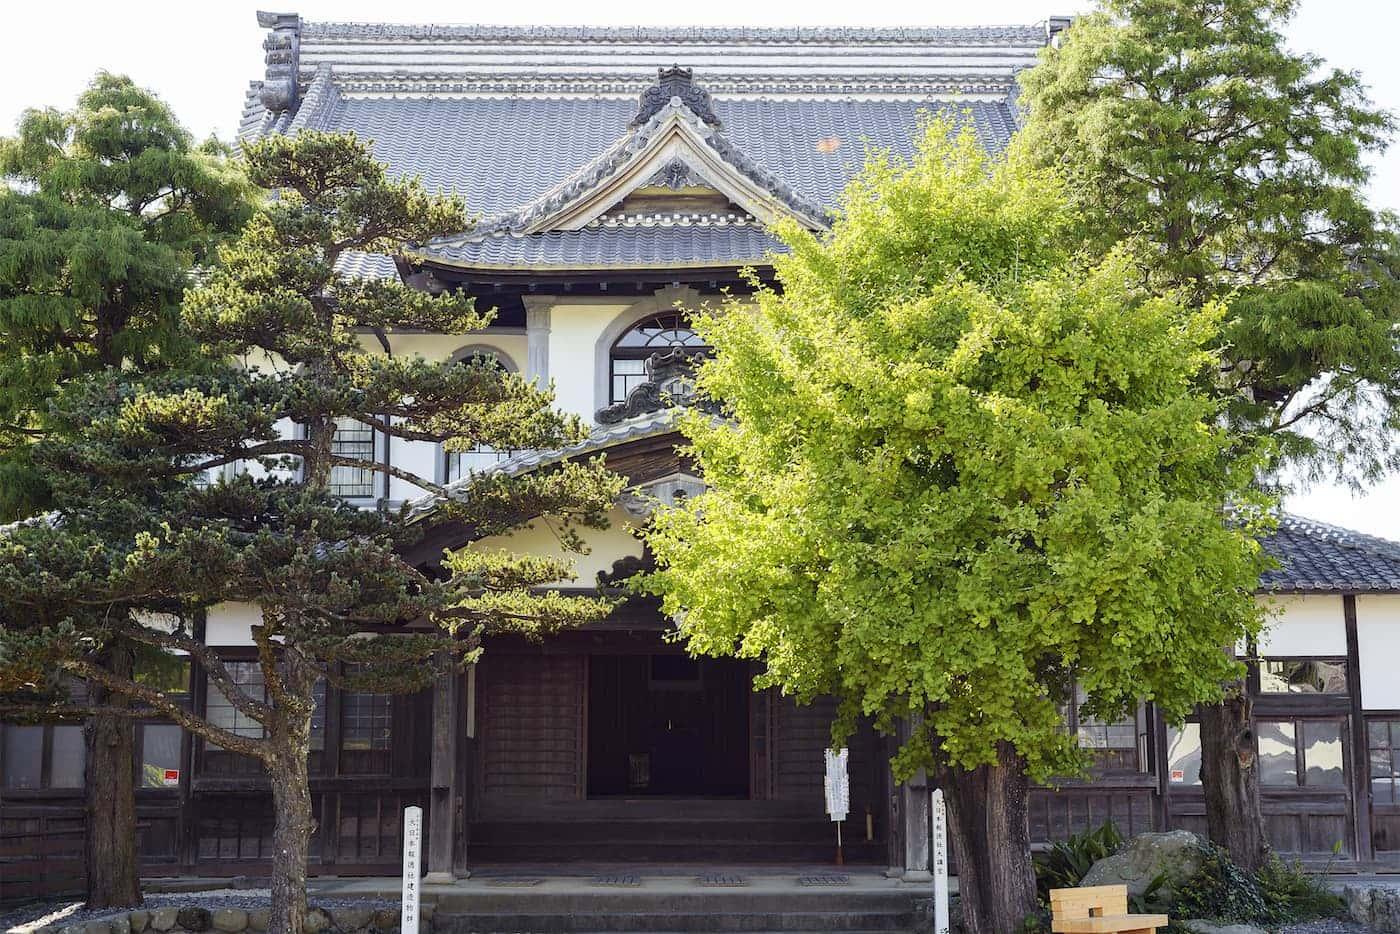 Dainihon Hotokusha